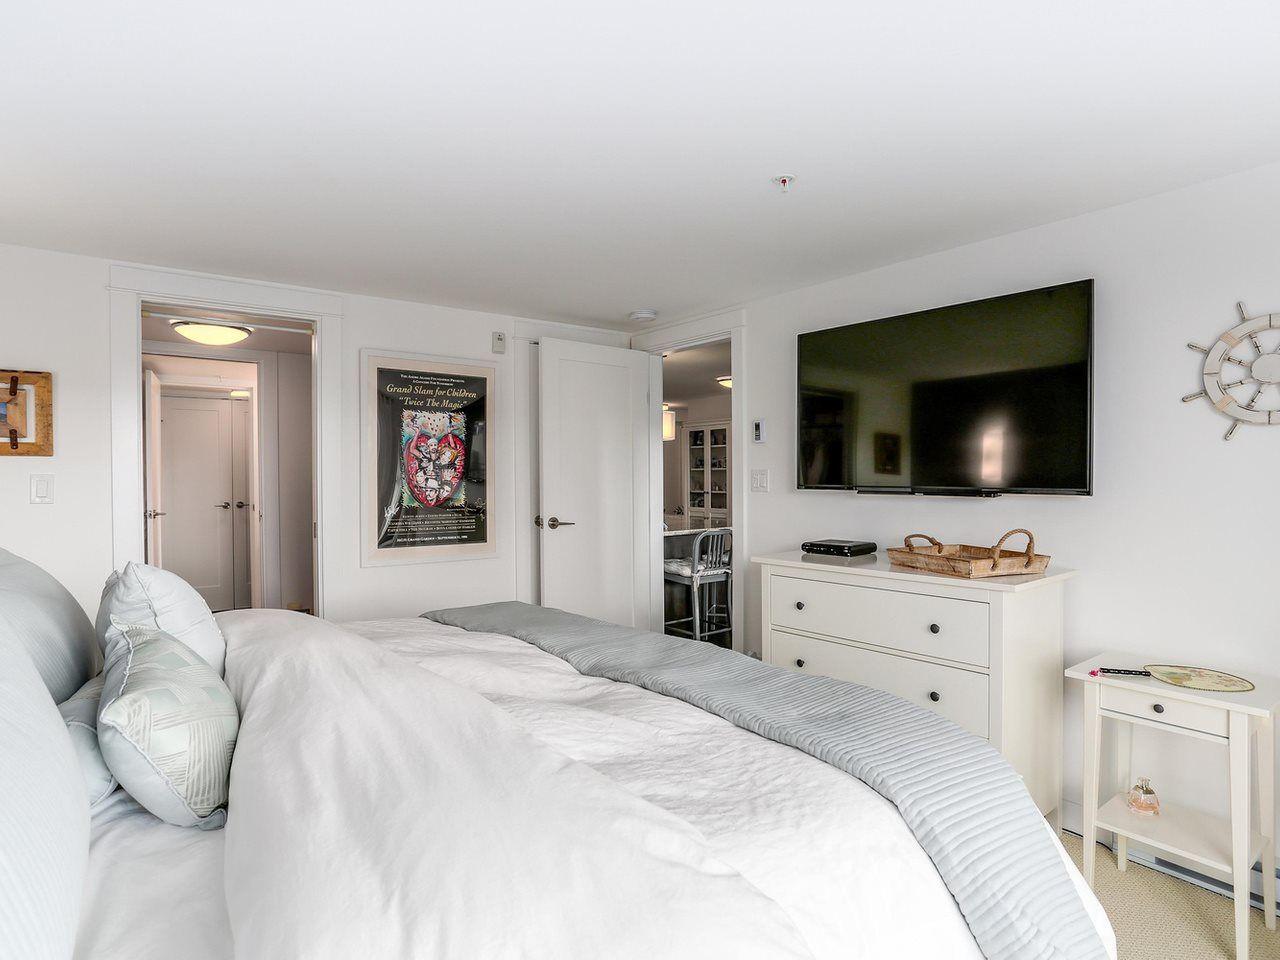 "Photo 12: Photos: 202 14955 VICTORIA Avenue: White Rock Condo for sale in ""SAUSALITO BEACH SIDE LIVING"" (South Surrey White Rock)  : MLS®# R2128764"